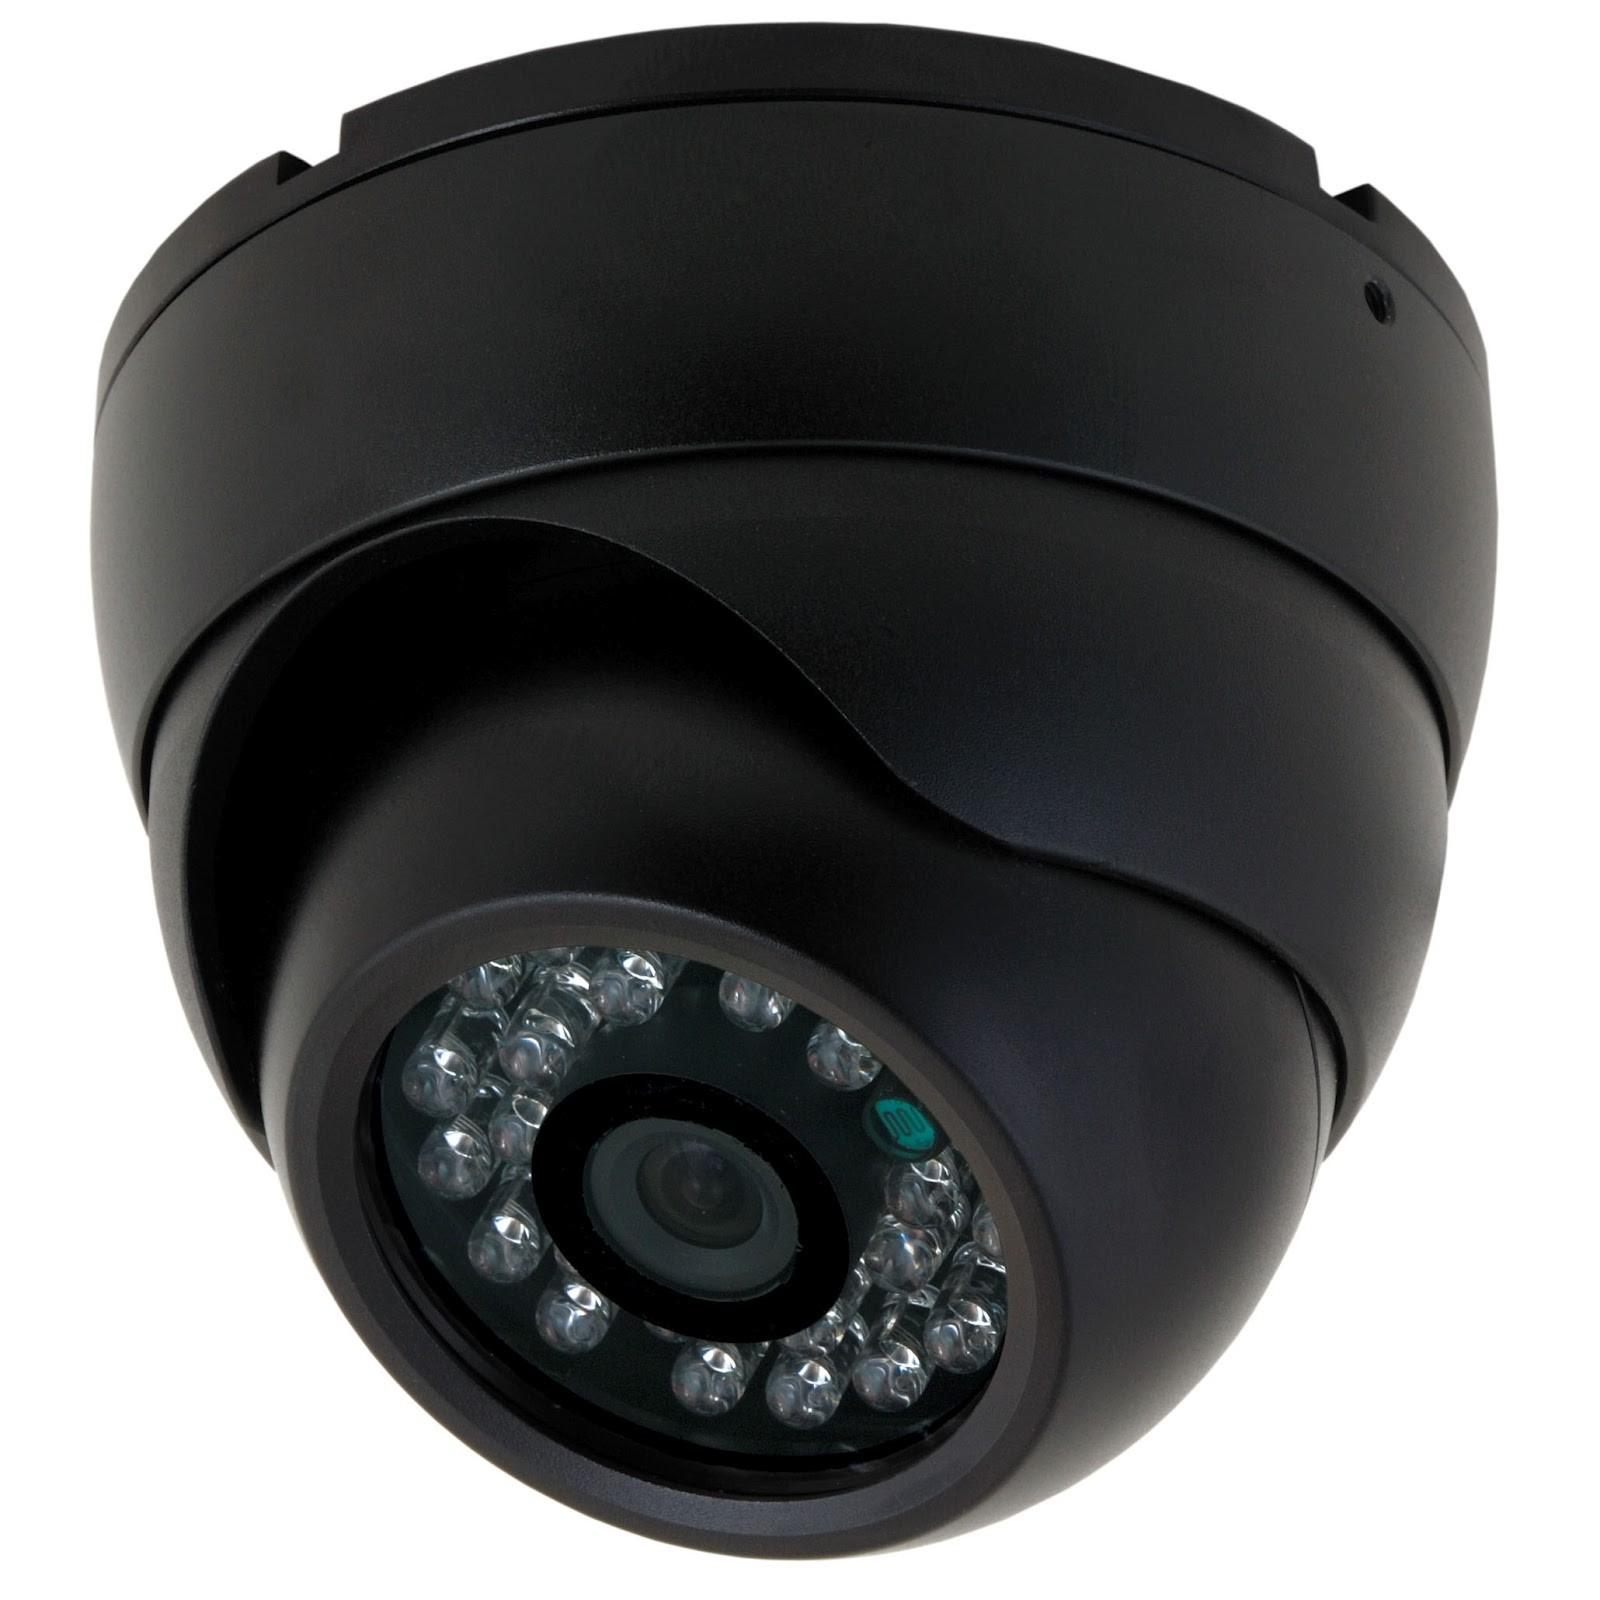 Мовирег ВК045 AHD 720 2.8 IR фото 1